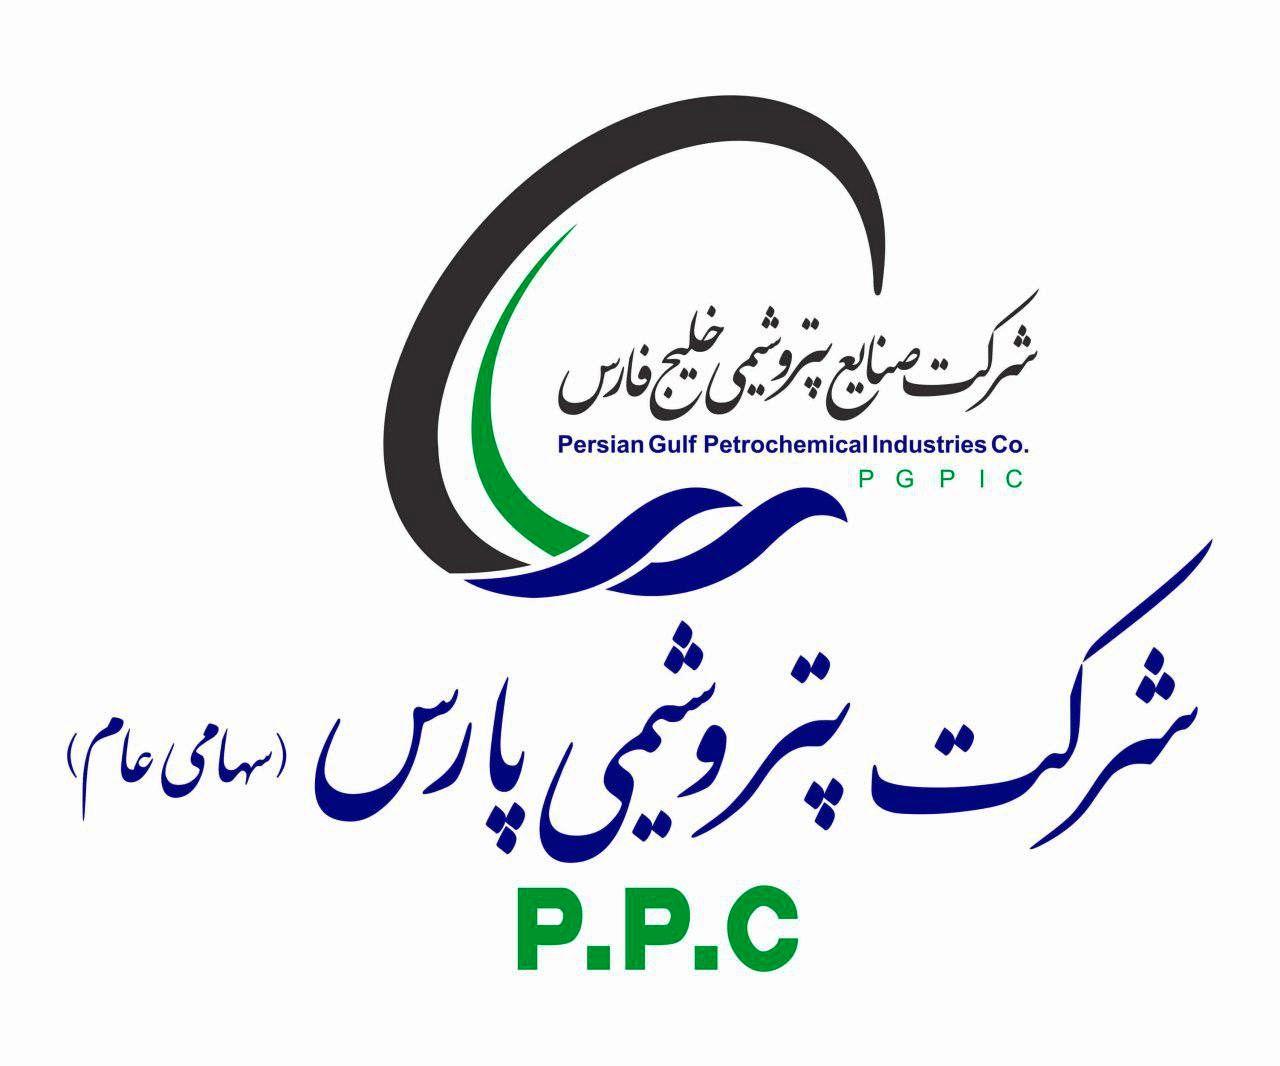 عضویت رسمی پتروشیمی پارس